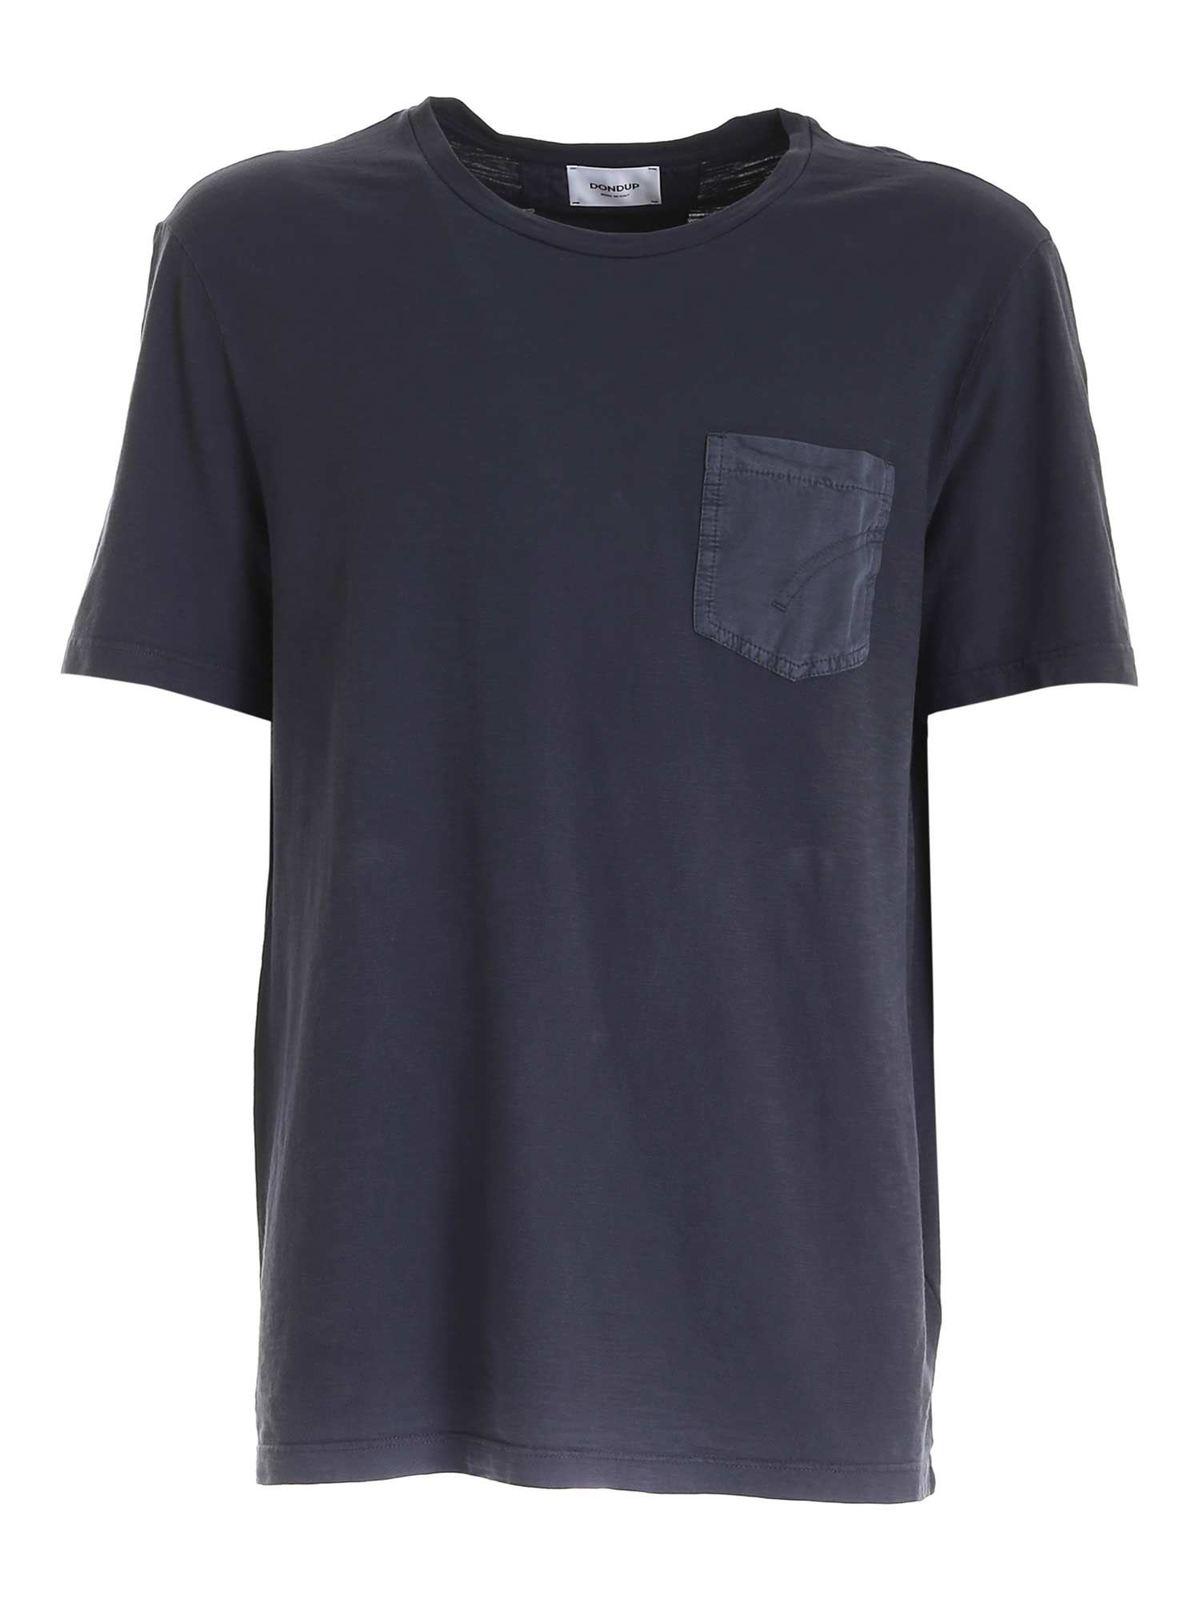 Dondup POCKET T-SHIRT IN BLUE